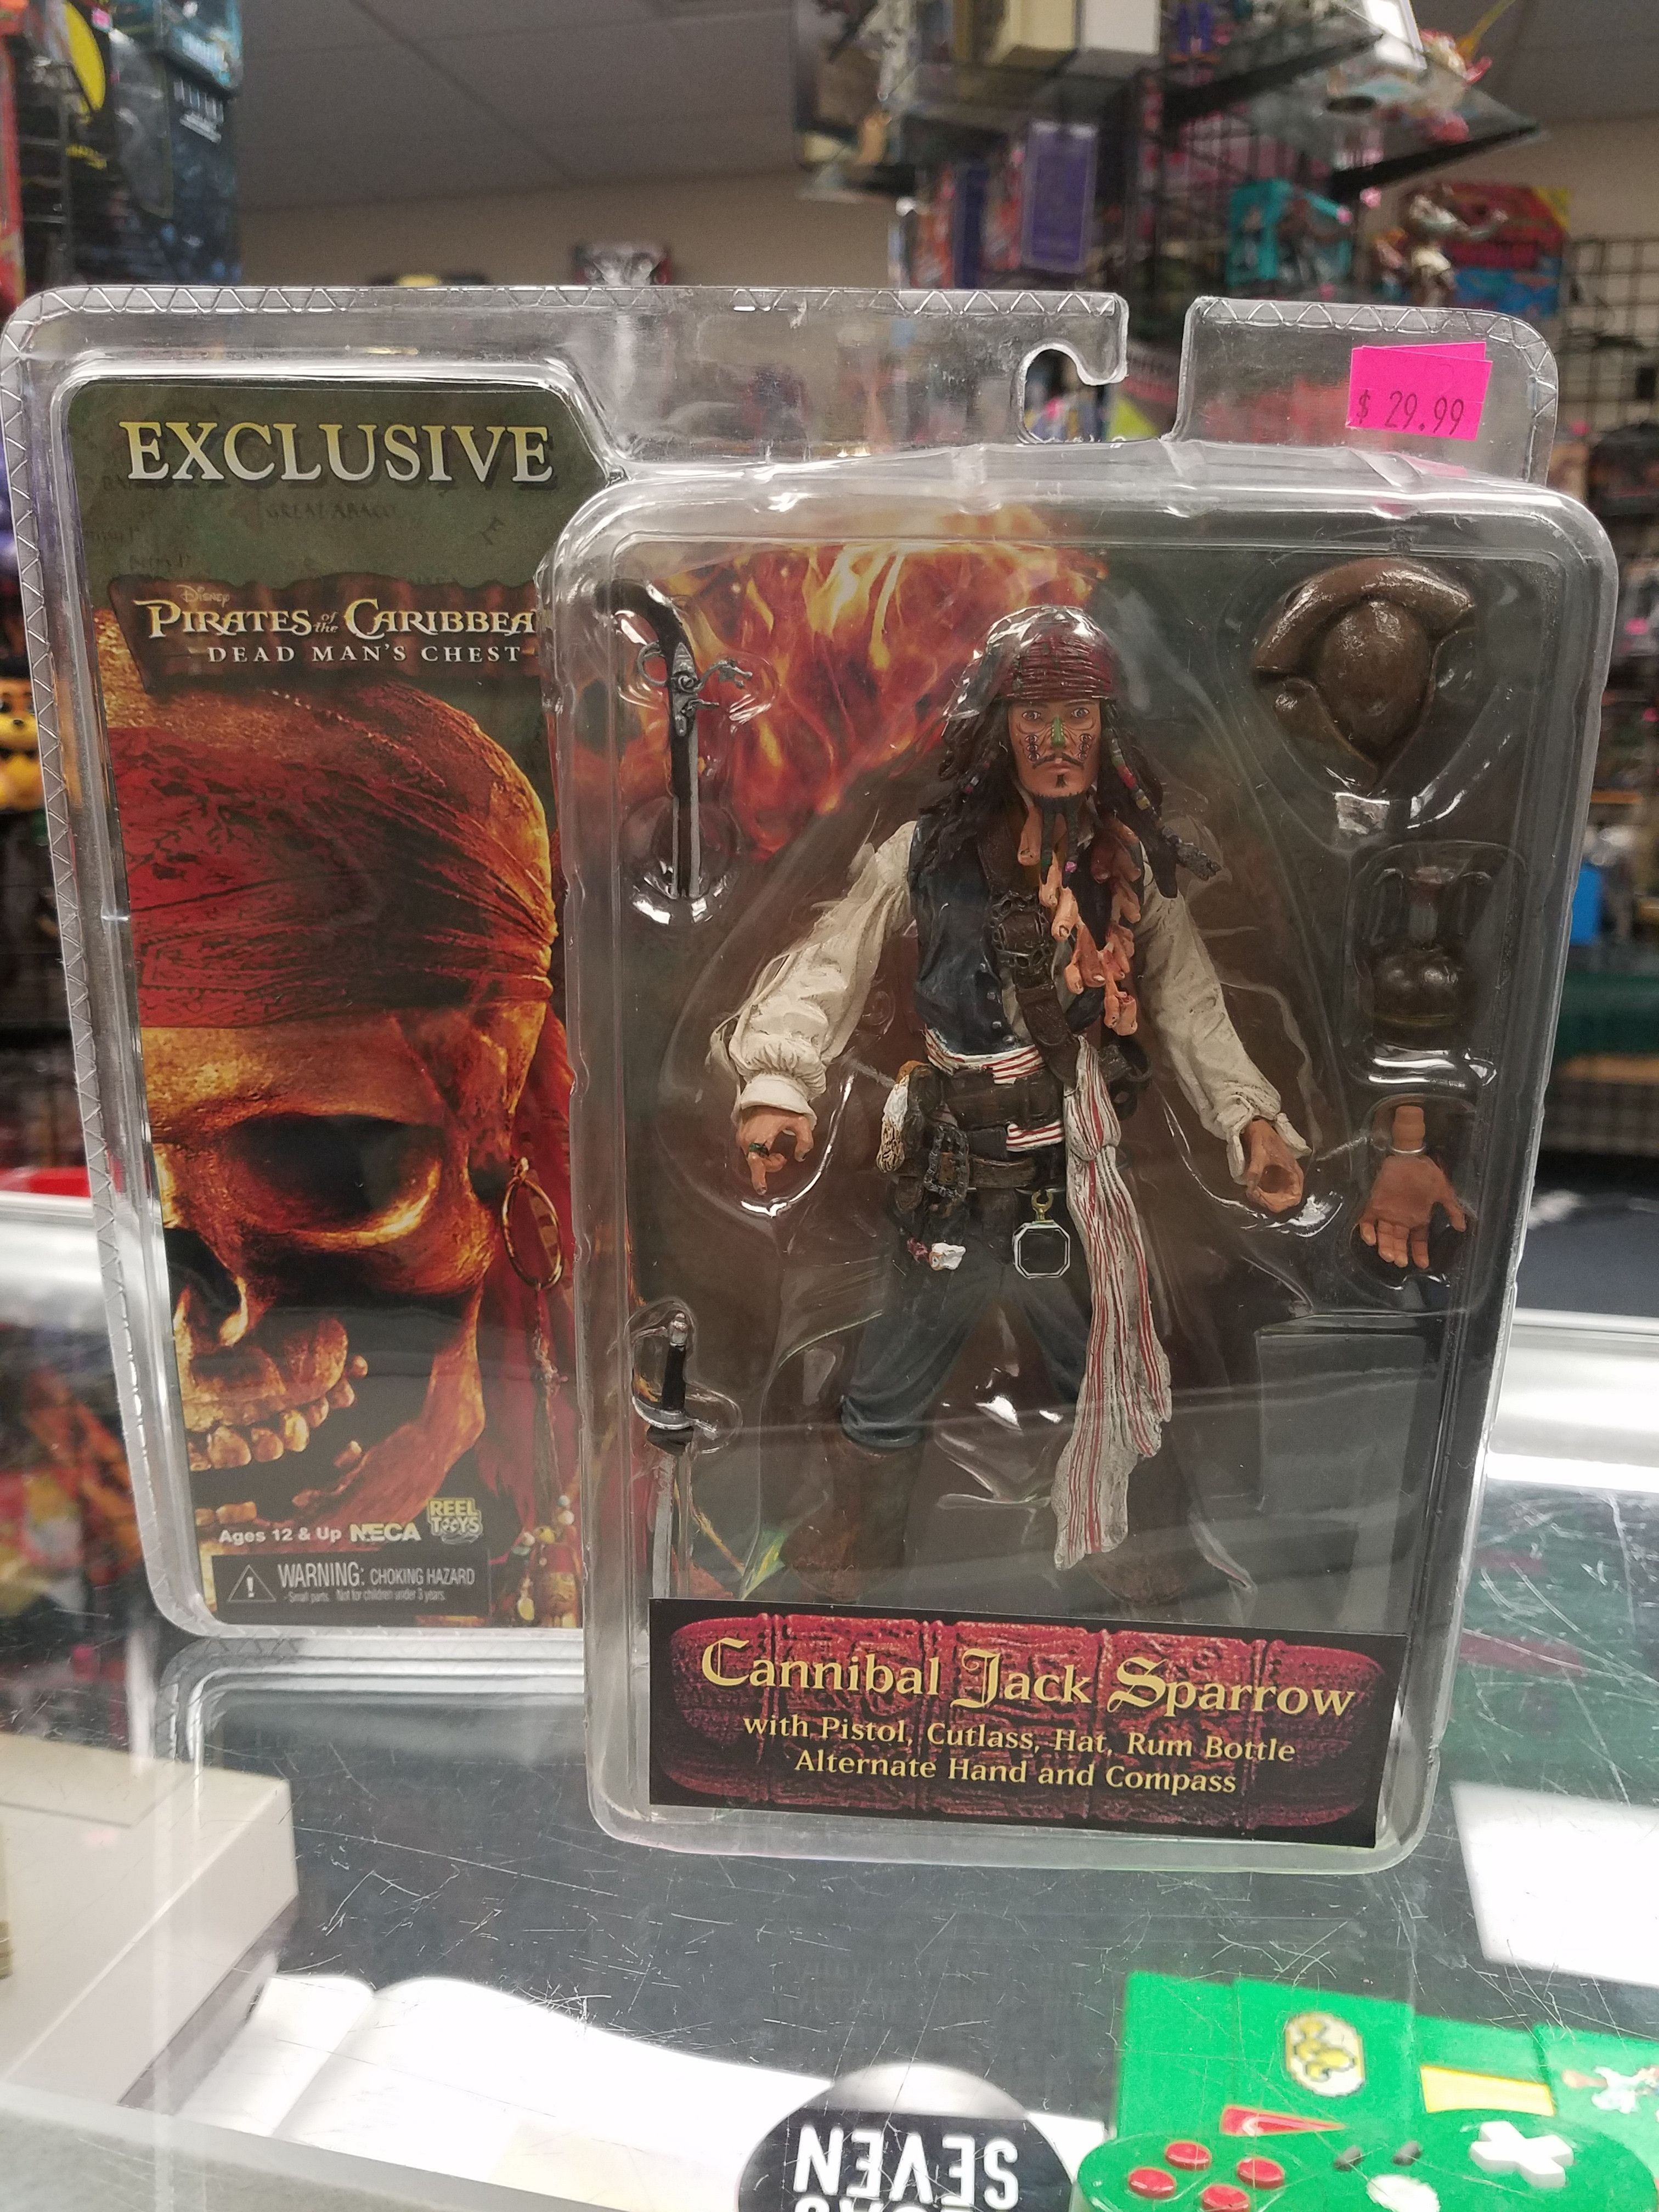 Pirates Of The Caribbean Toys : Neca reel toys pirates of the caribbean dead man s chest